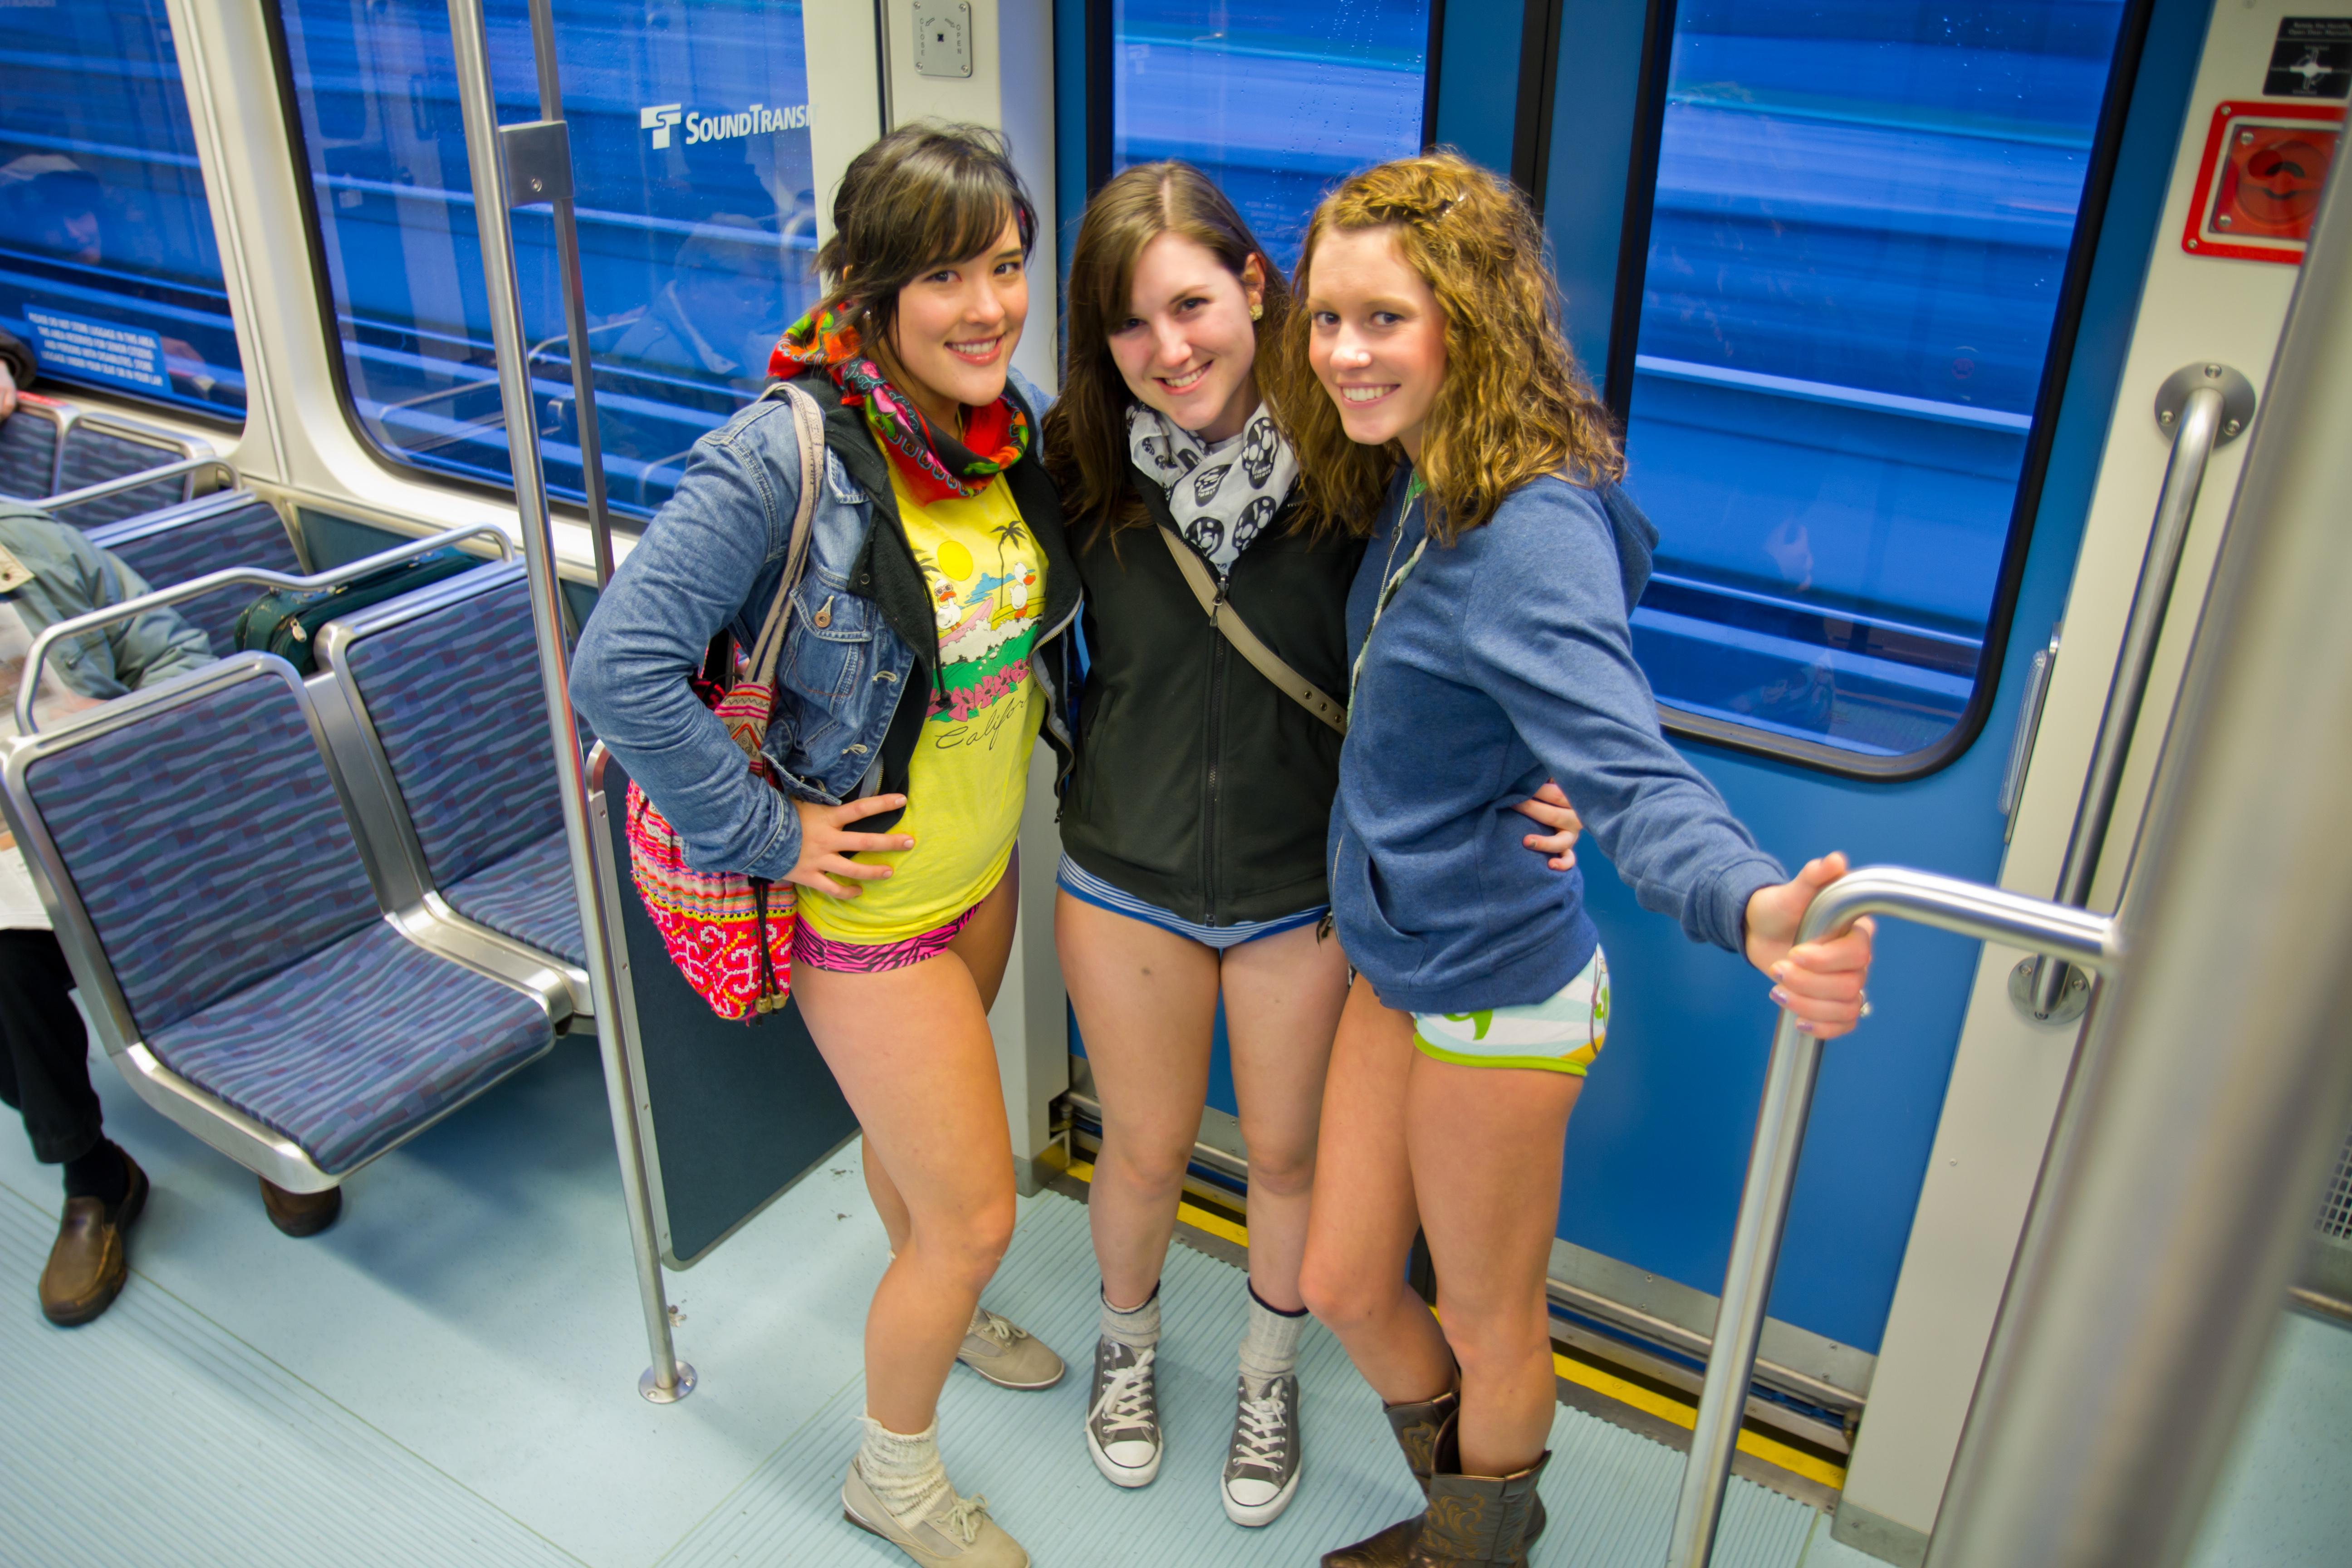 Girl flashing at subway #12